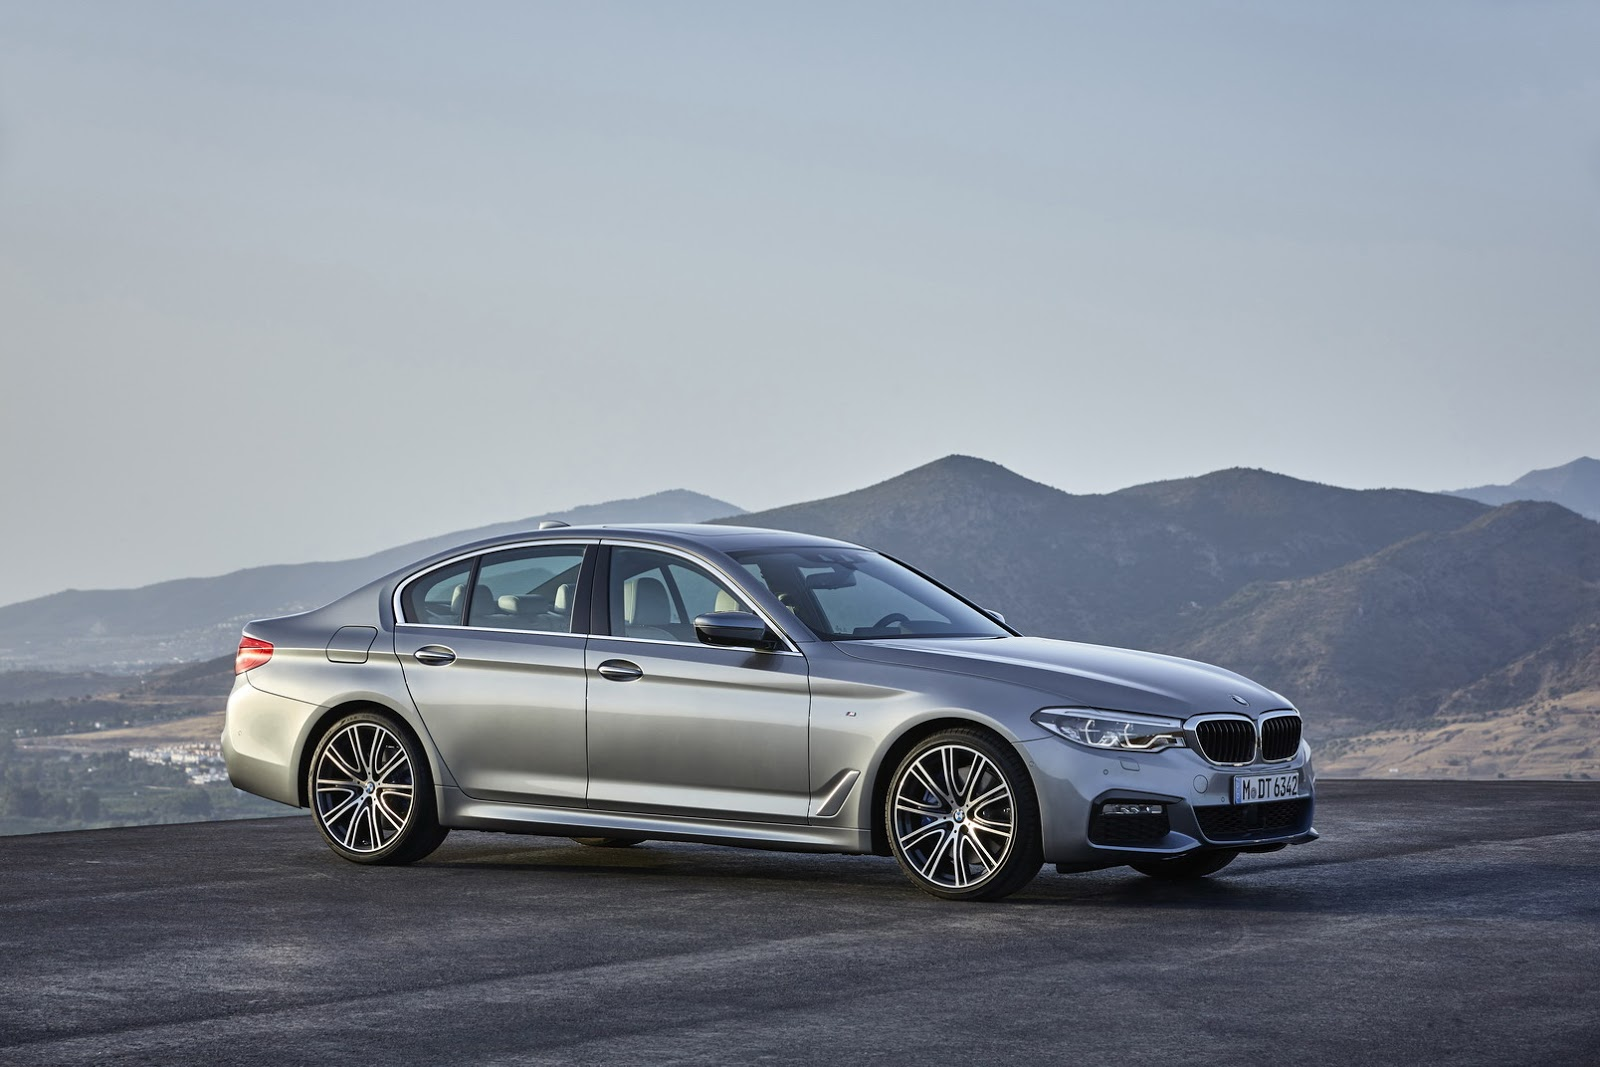 2017-BMW-5-Series-16.jpg